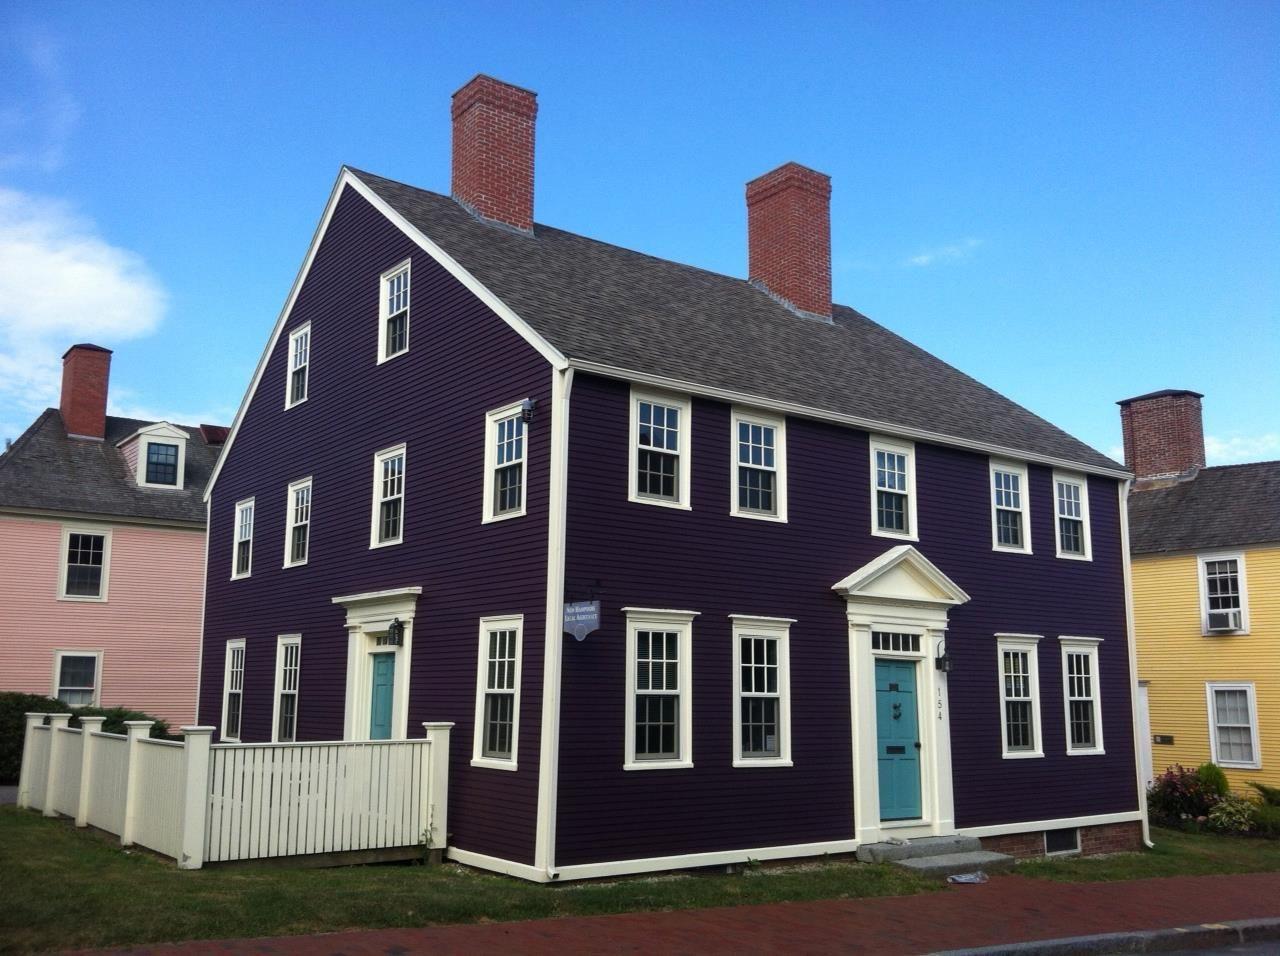 Eggplant House Slate Roof Google Search House Exterior Exterior House Colors Exterior Paint Colors For House